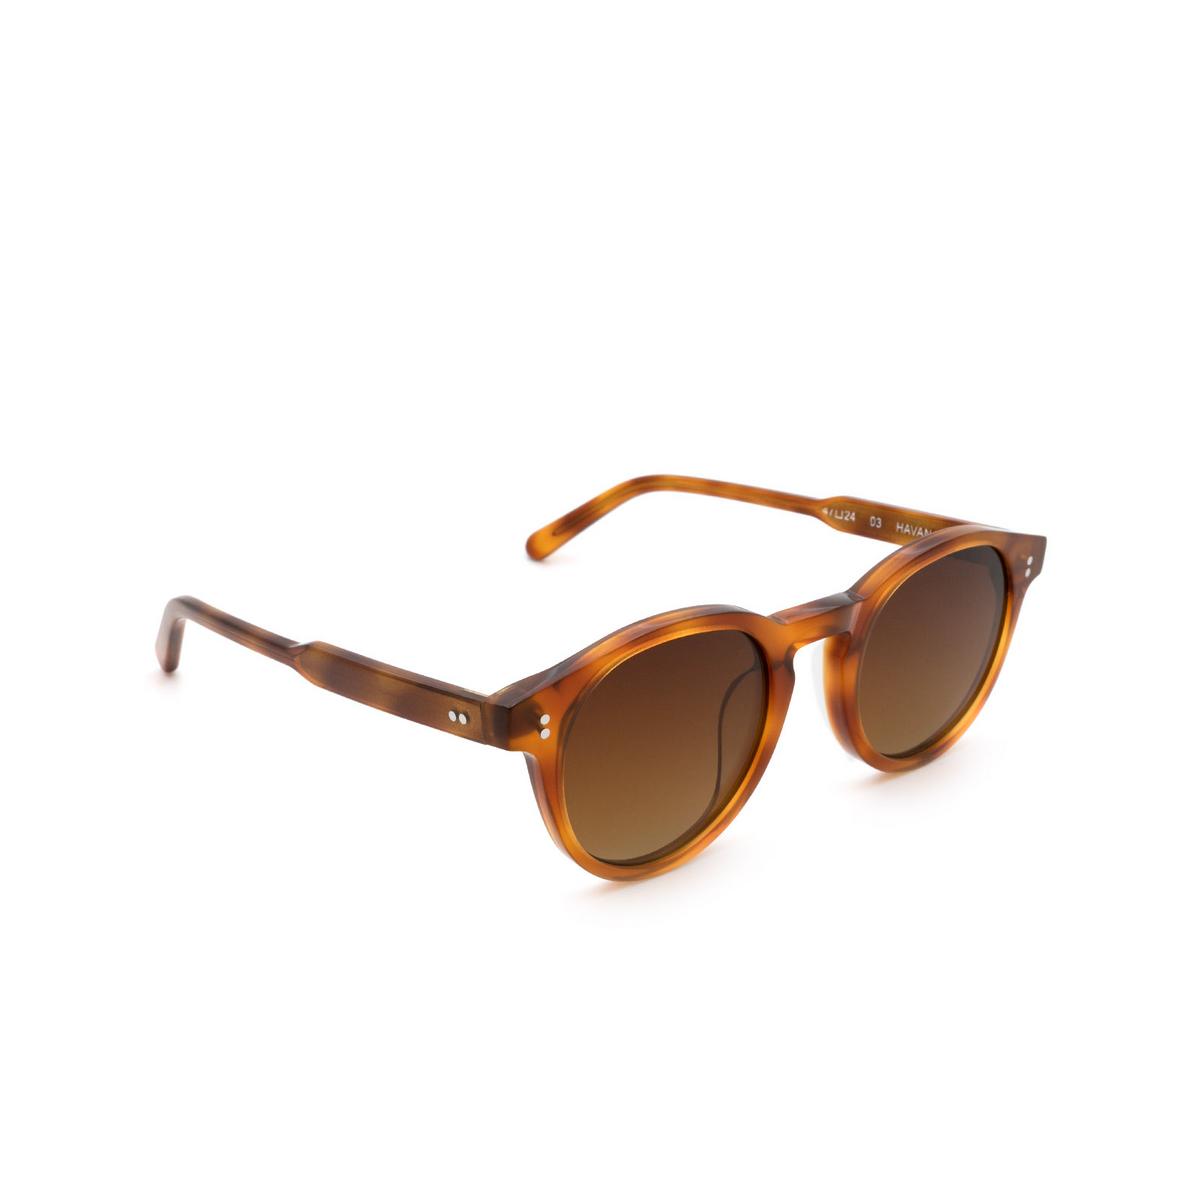 Chimi® Round Sunglasses: 03 color Havana - three-quarters view.